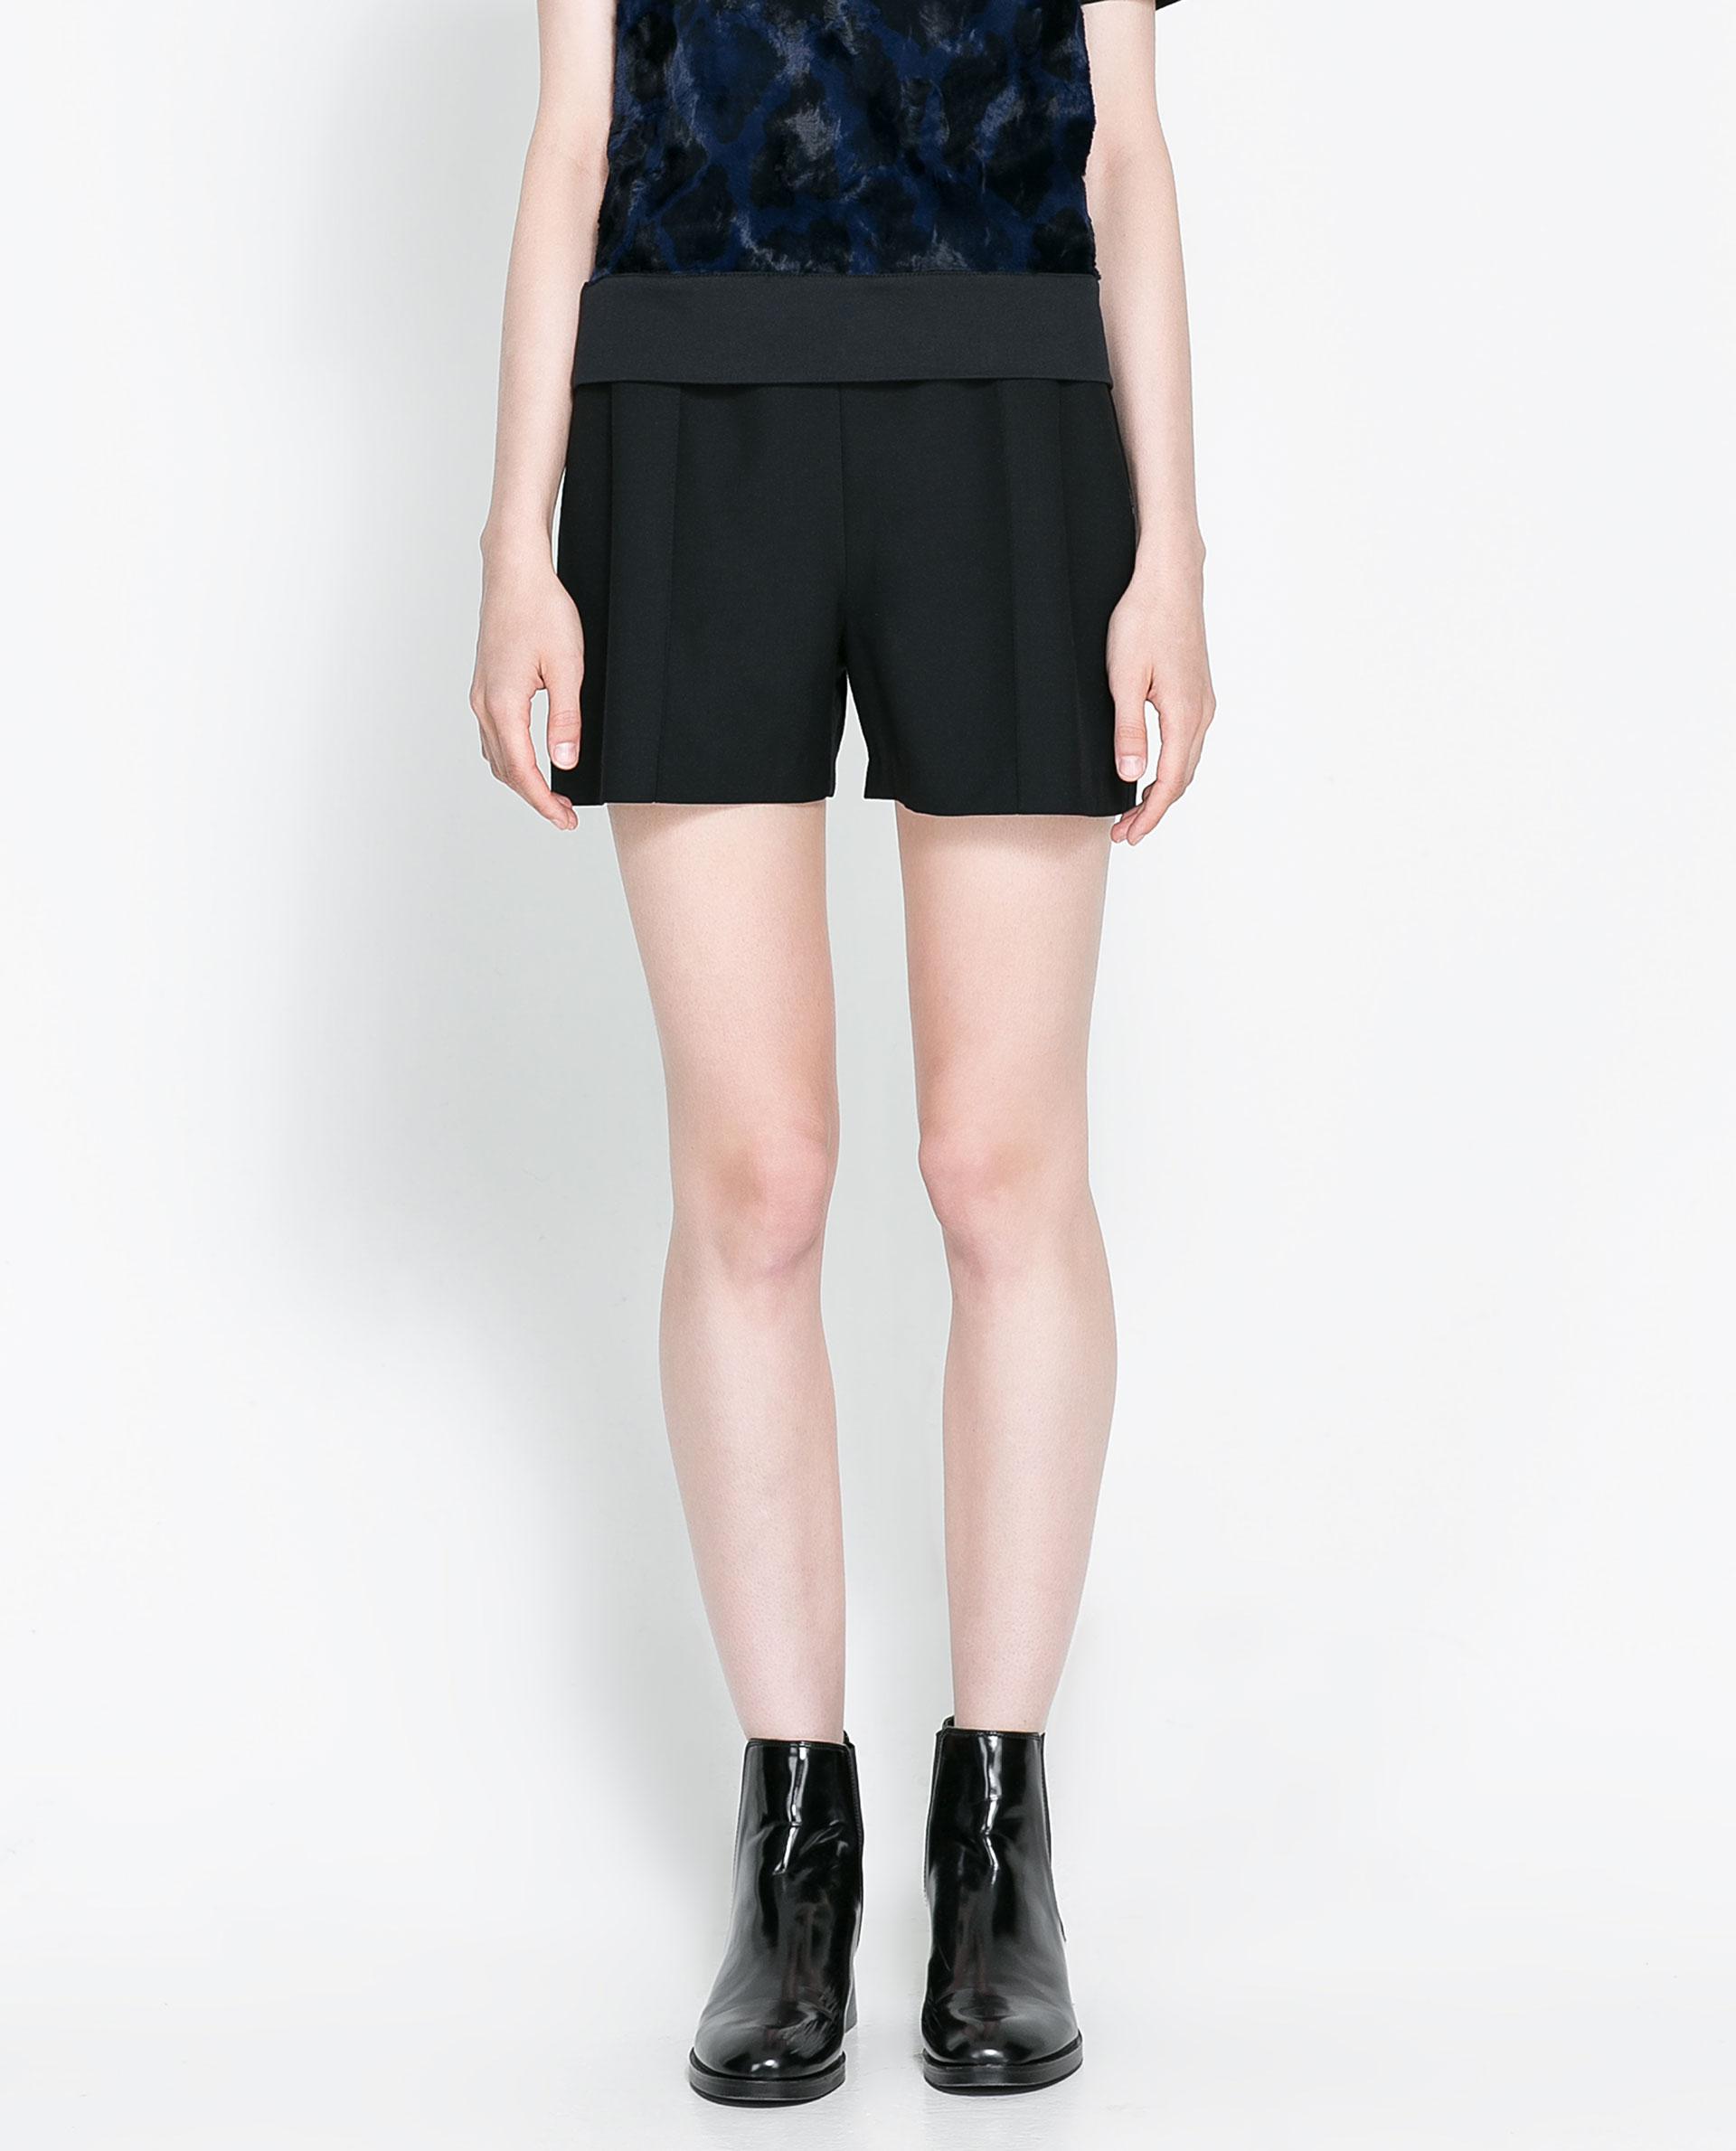 Zara High-waisted Bermuda Shorts in Black | Lyst